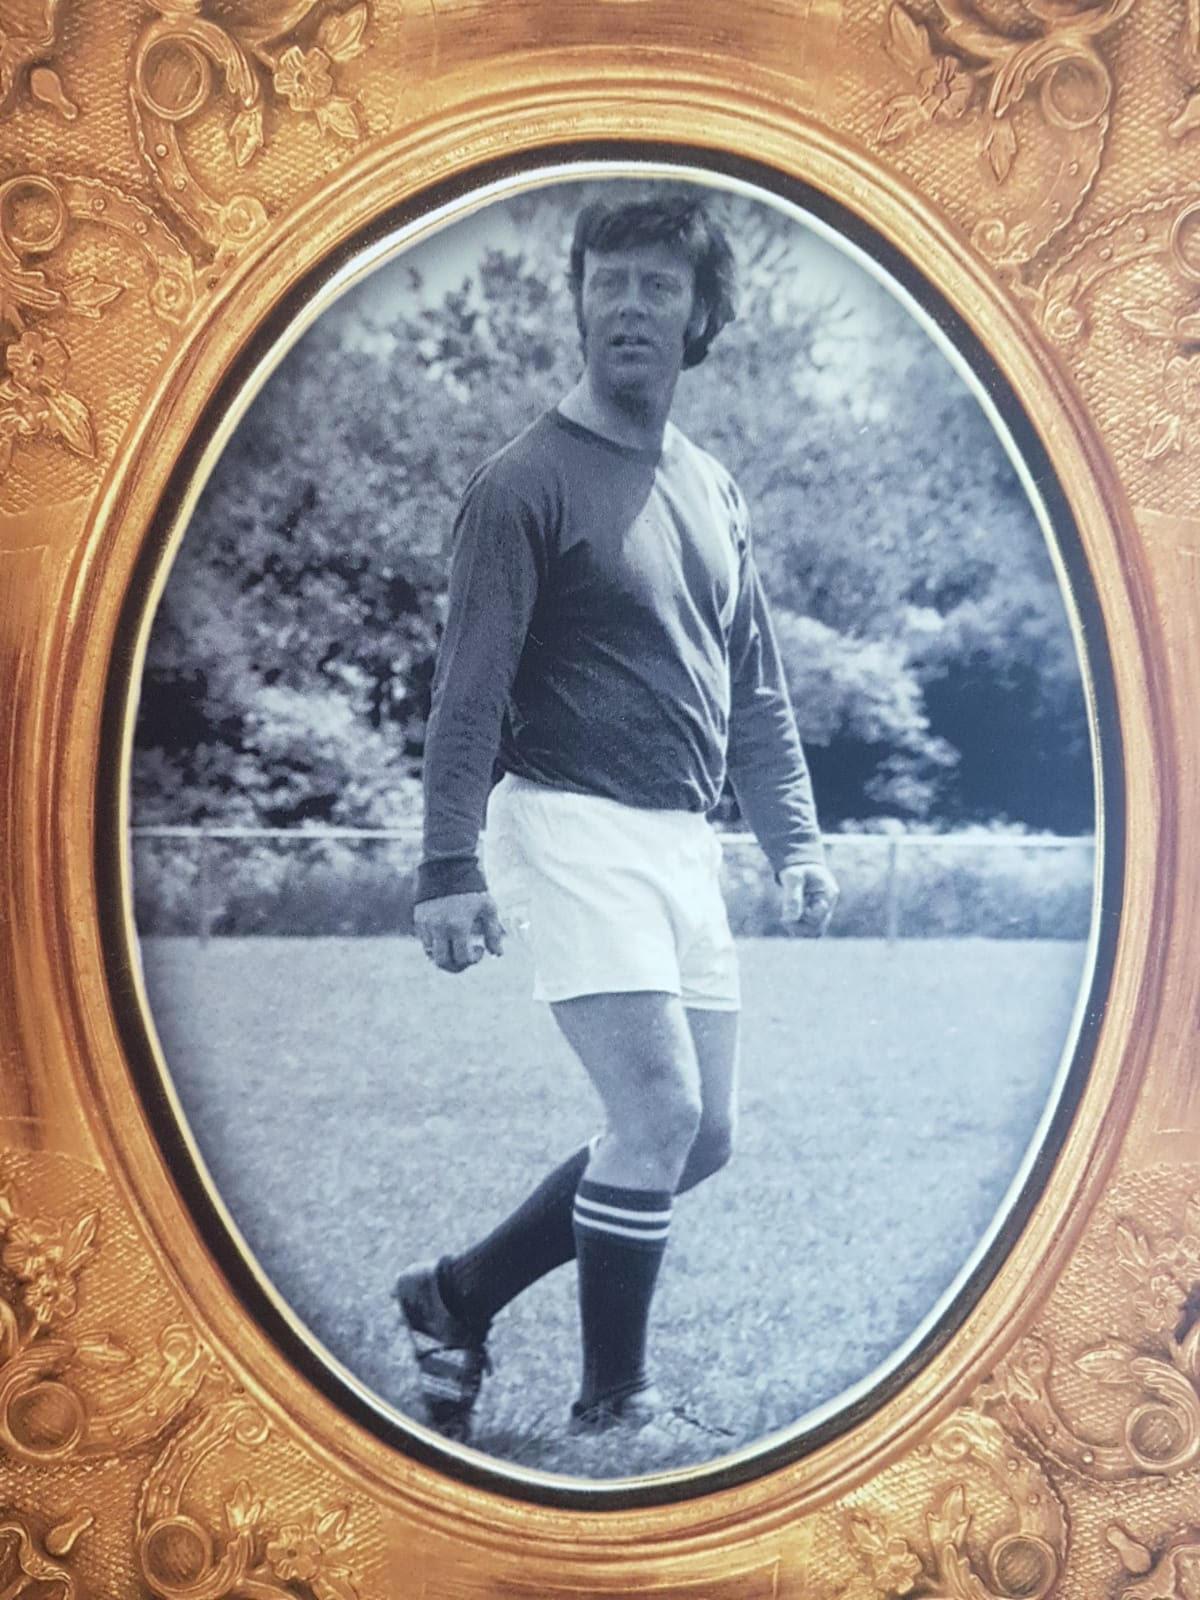 In memoriam: Eddy Groeneveld 18-04-1936 - 07-07-2018